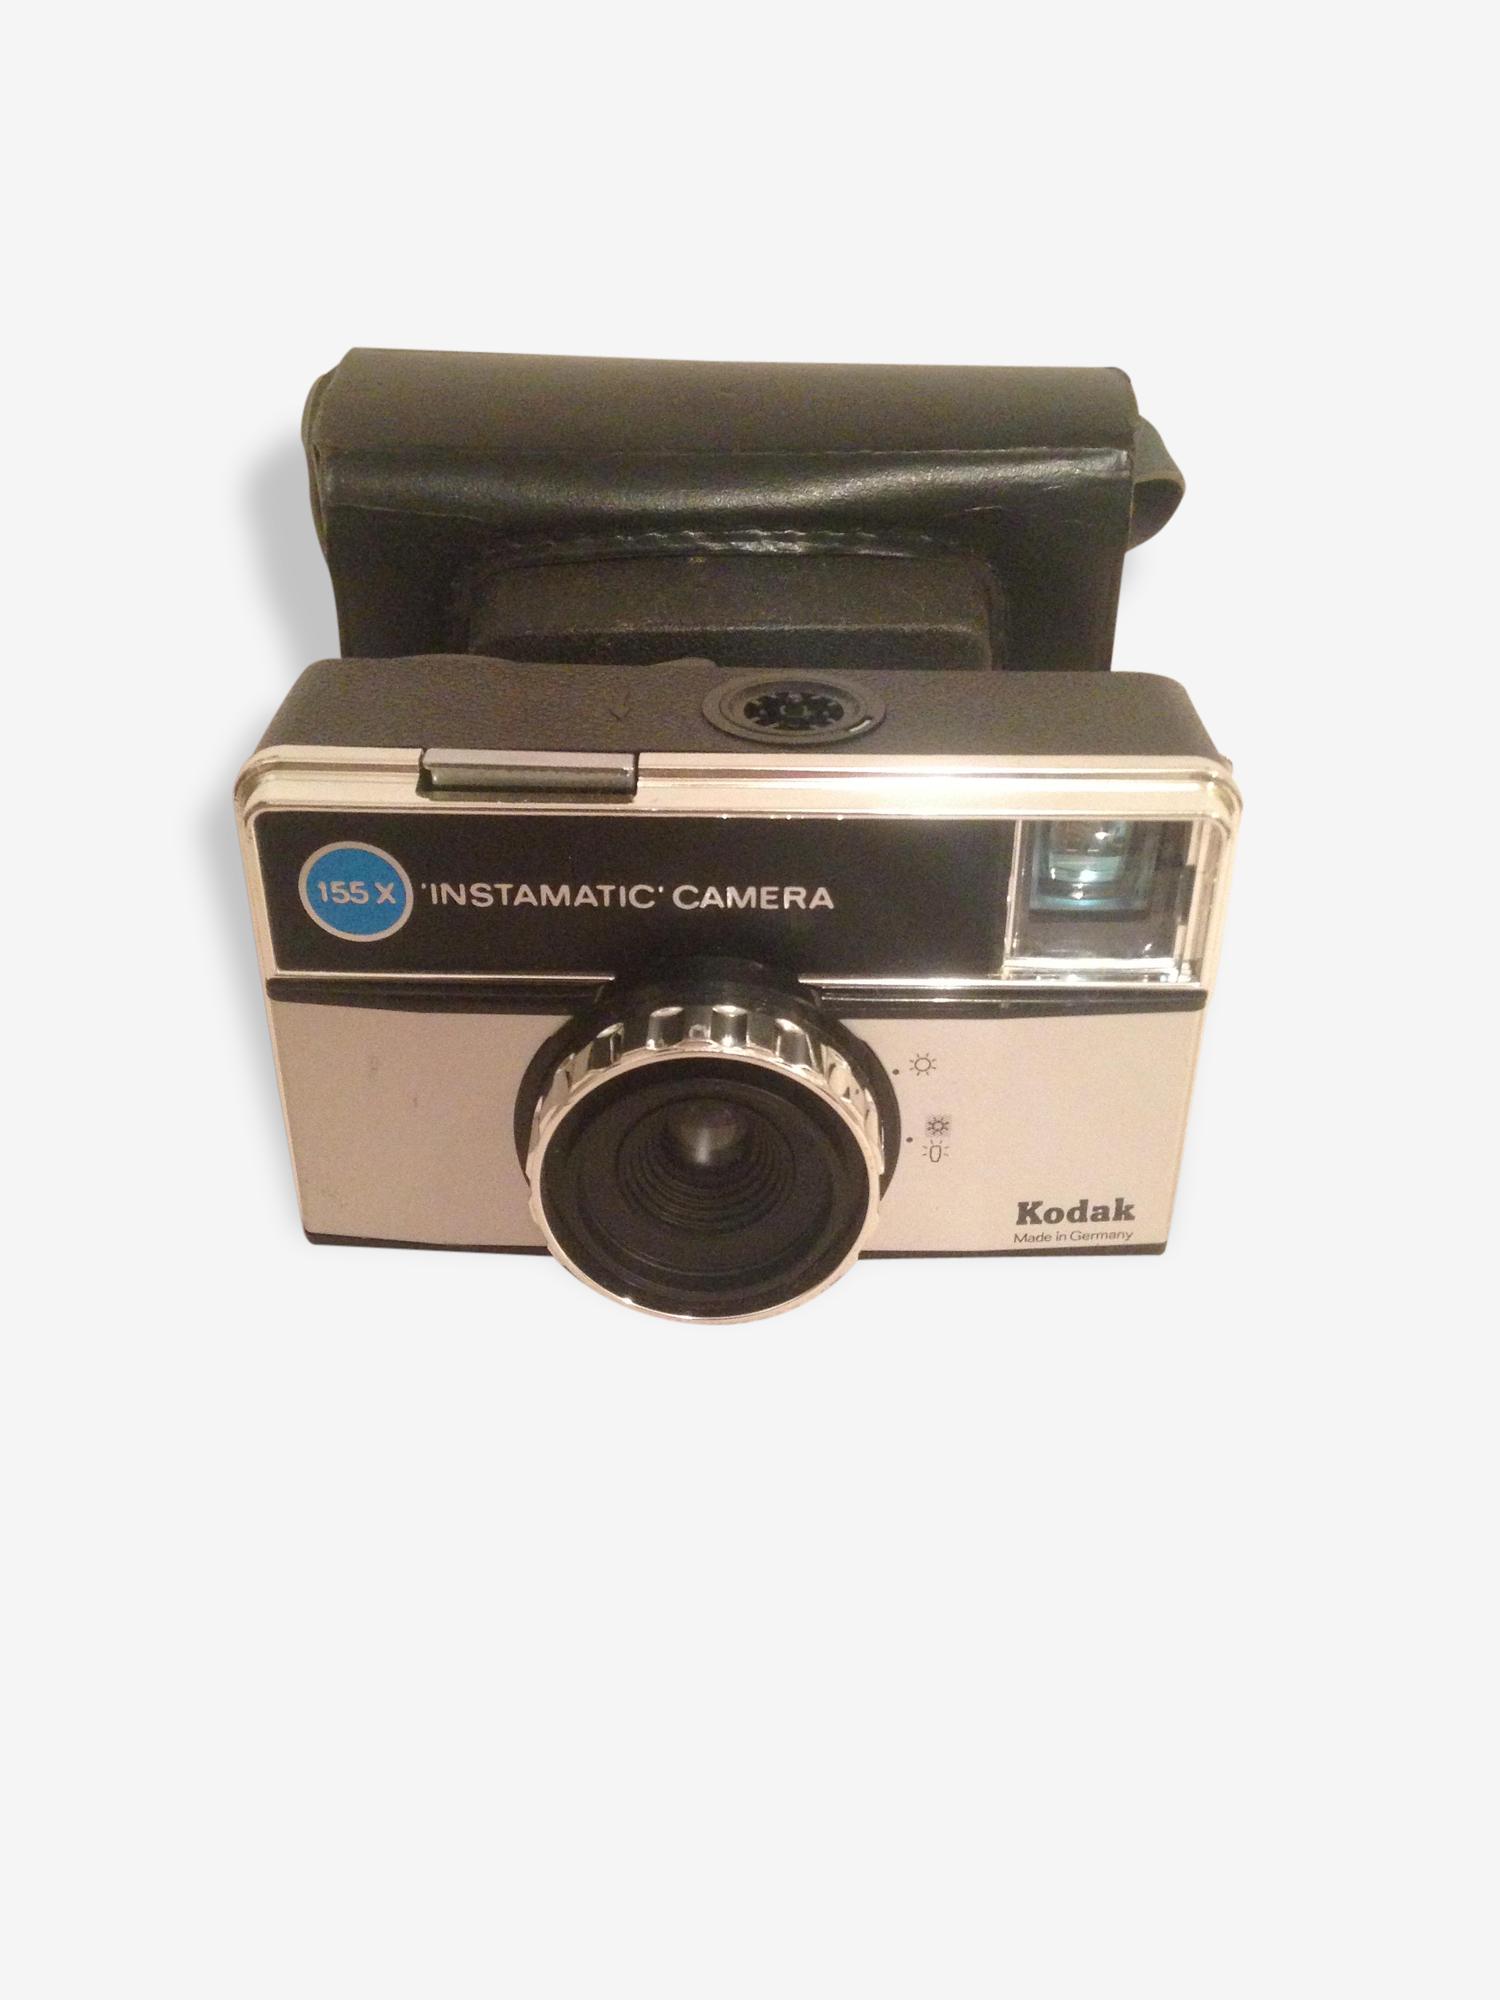 Appareil Photo Ancien KODAK 155X Instamatic Camera + Etui Cuir Vintage